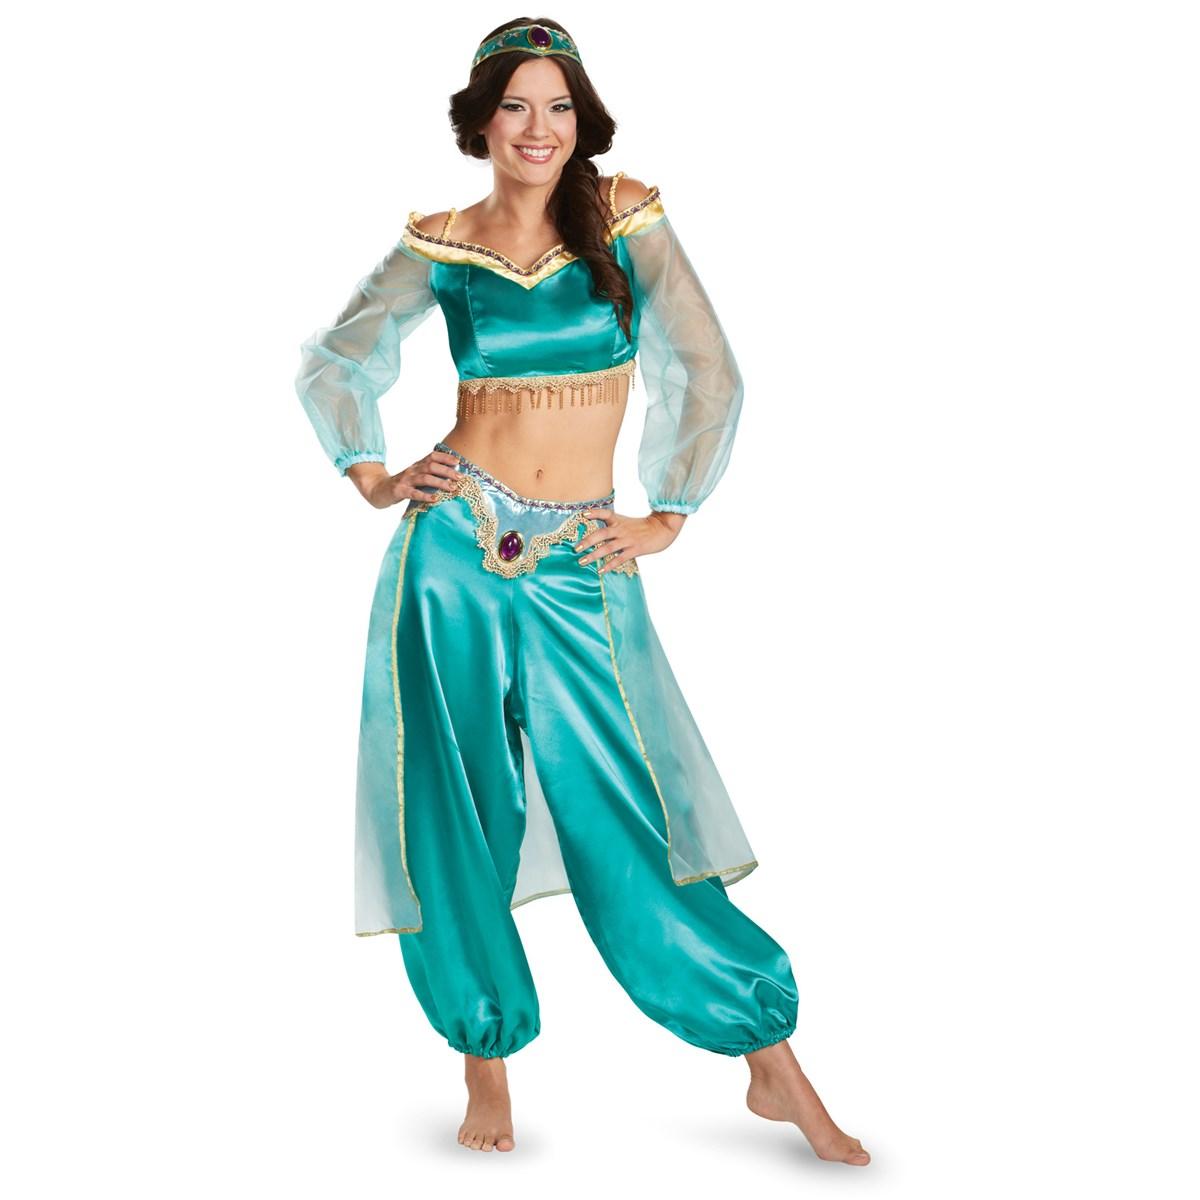 Disney princess gowns for adults - Disney Princess Jasmine Prestige Fab Costume For Women Buycostumes Com